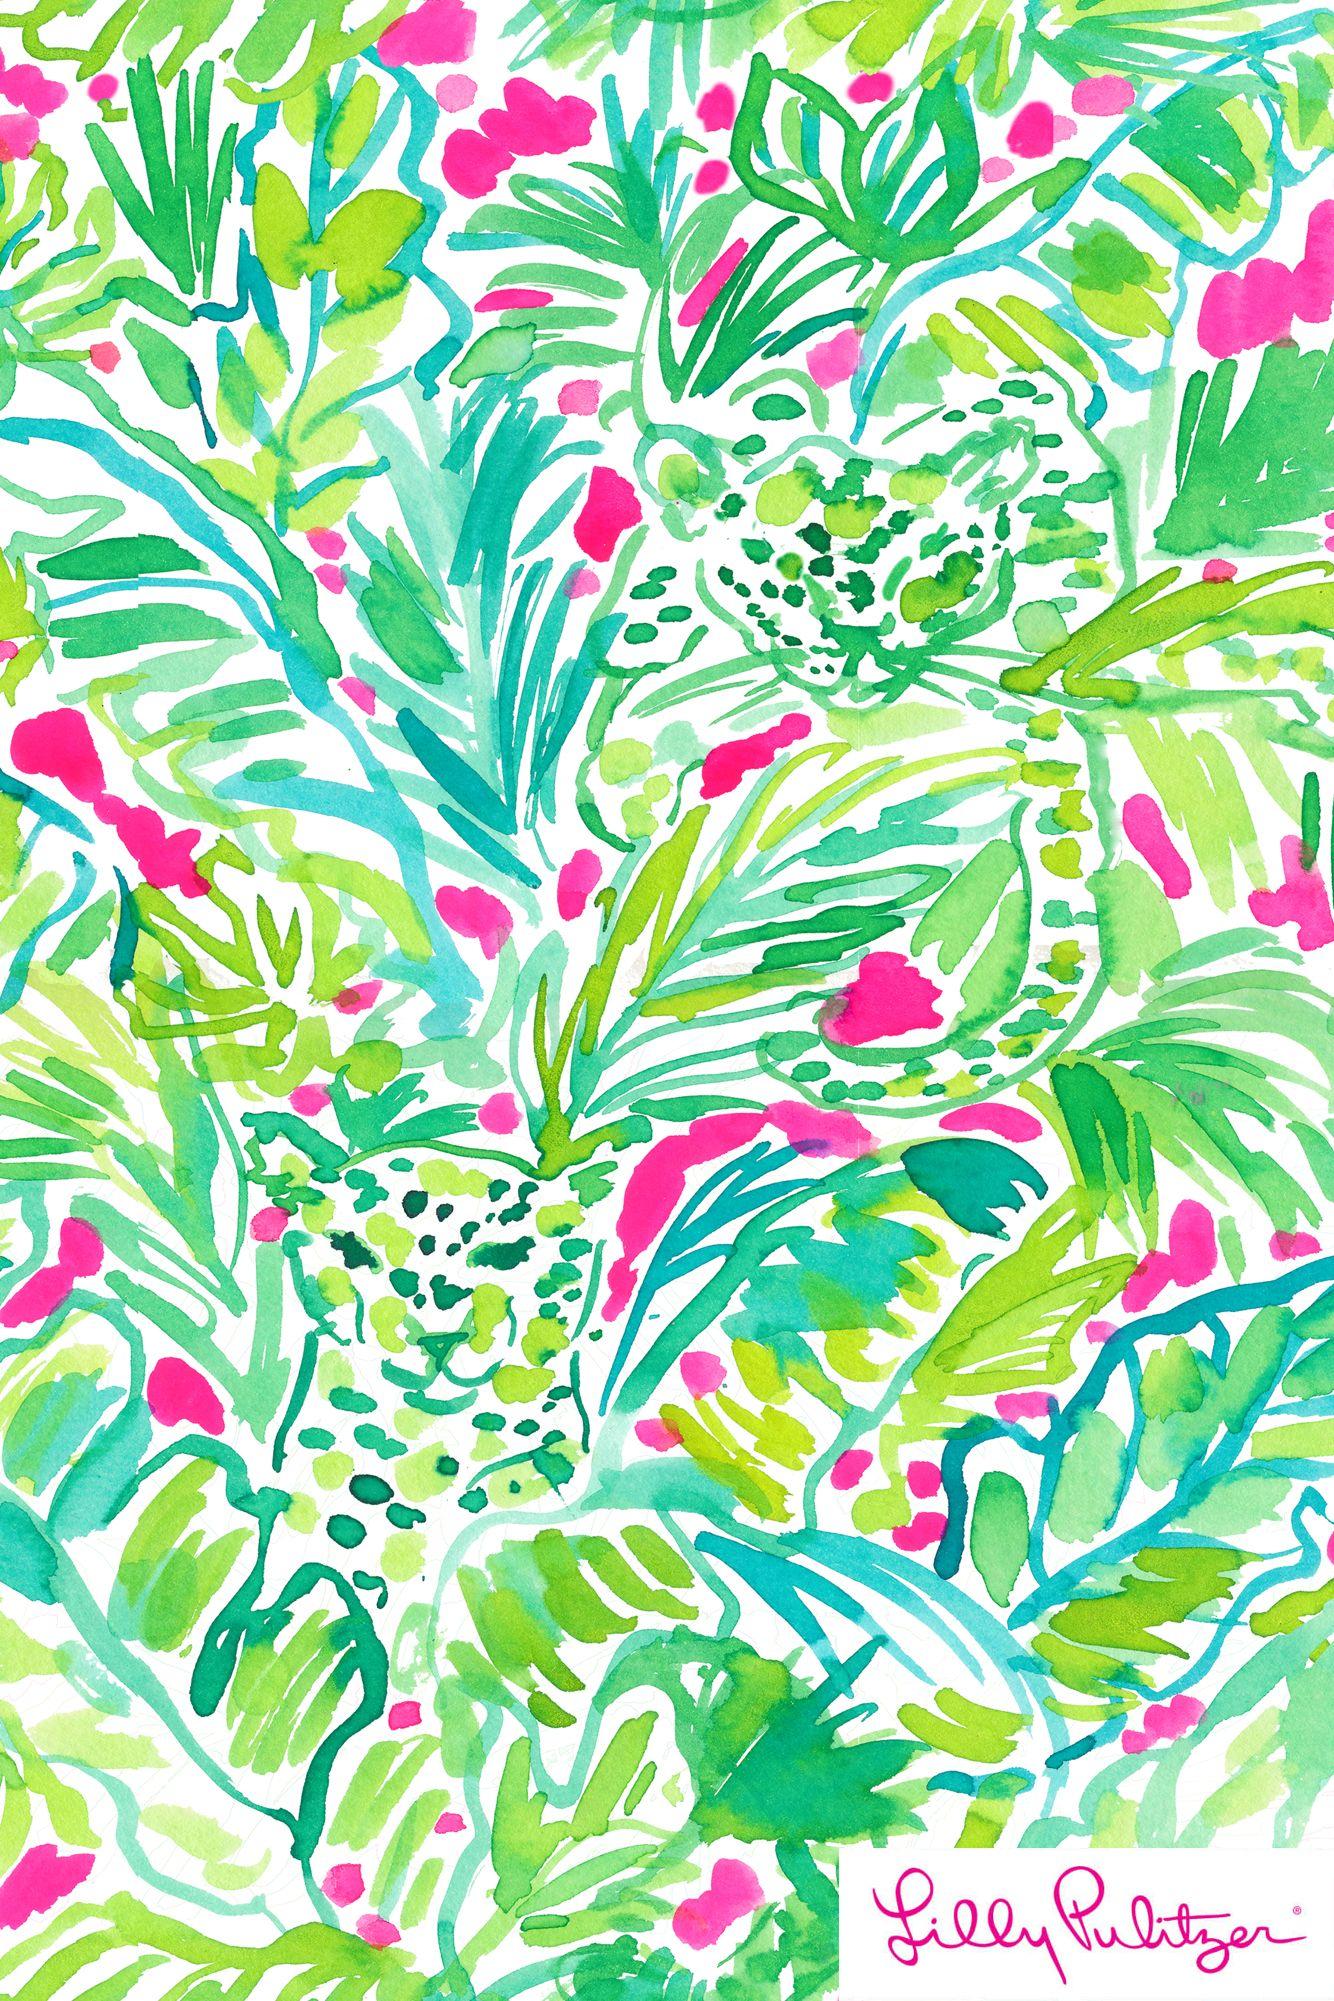 Palm Beach Jungle Lilly Pulitzer X Starbucks 2017 Lily